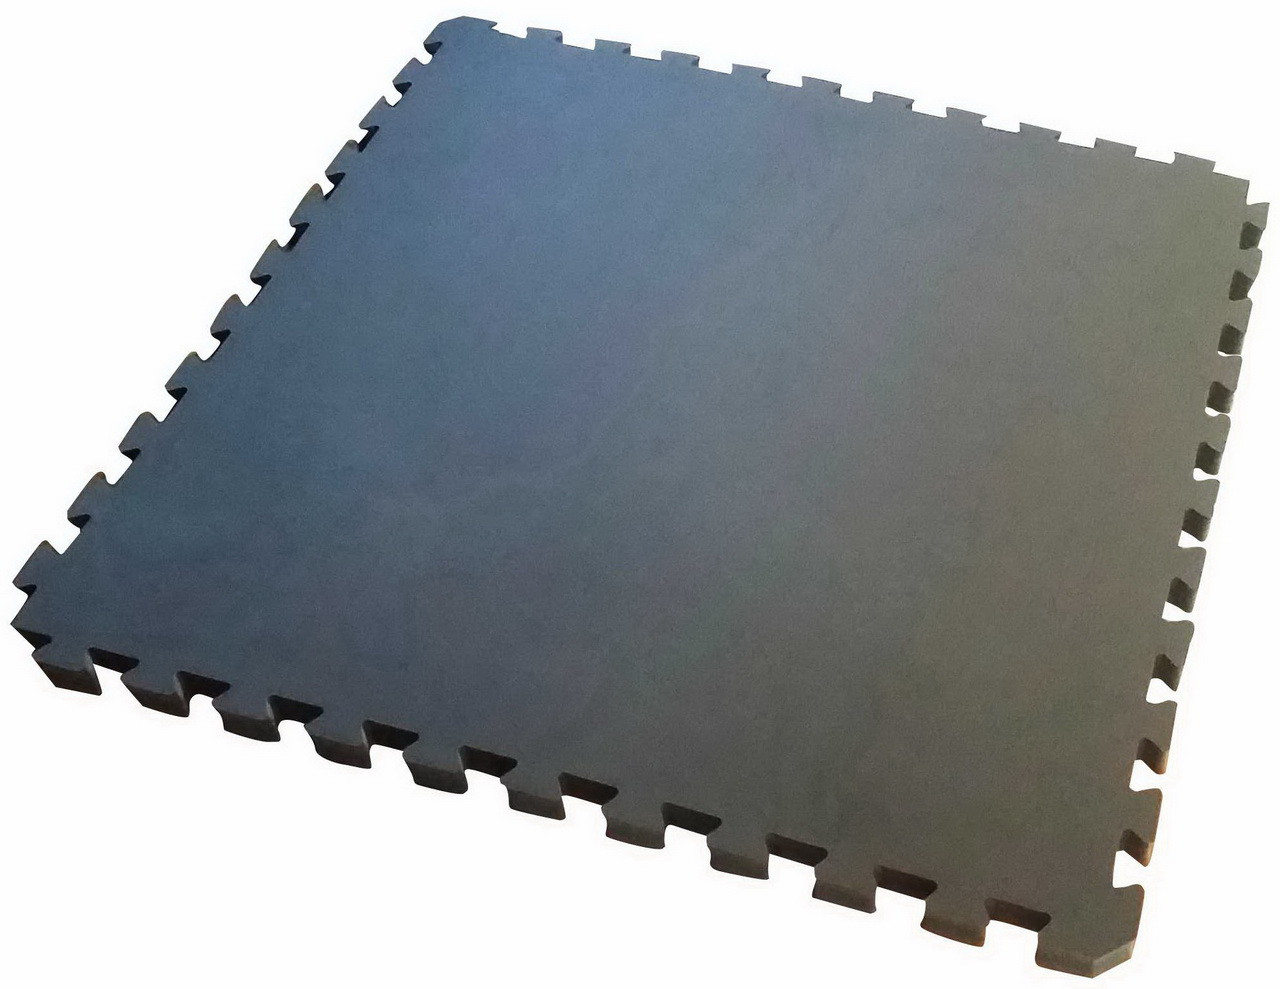 Мат IZOLON Base ласточкин хвост 40 мм (Серый)